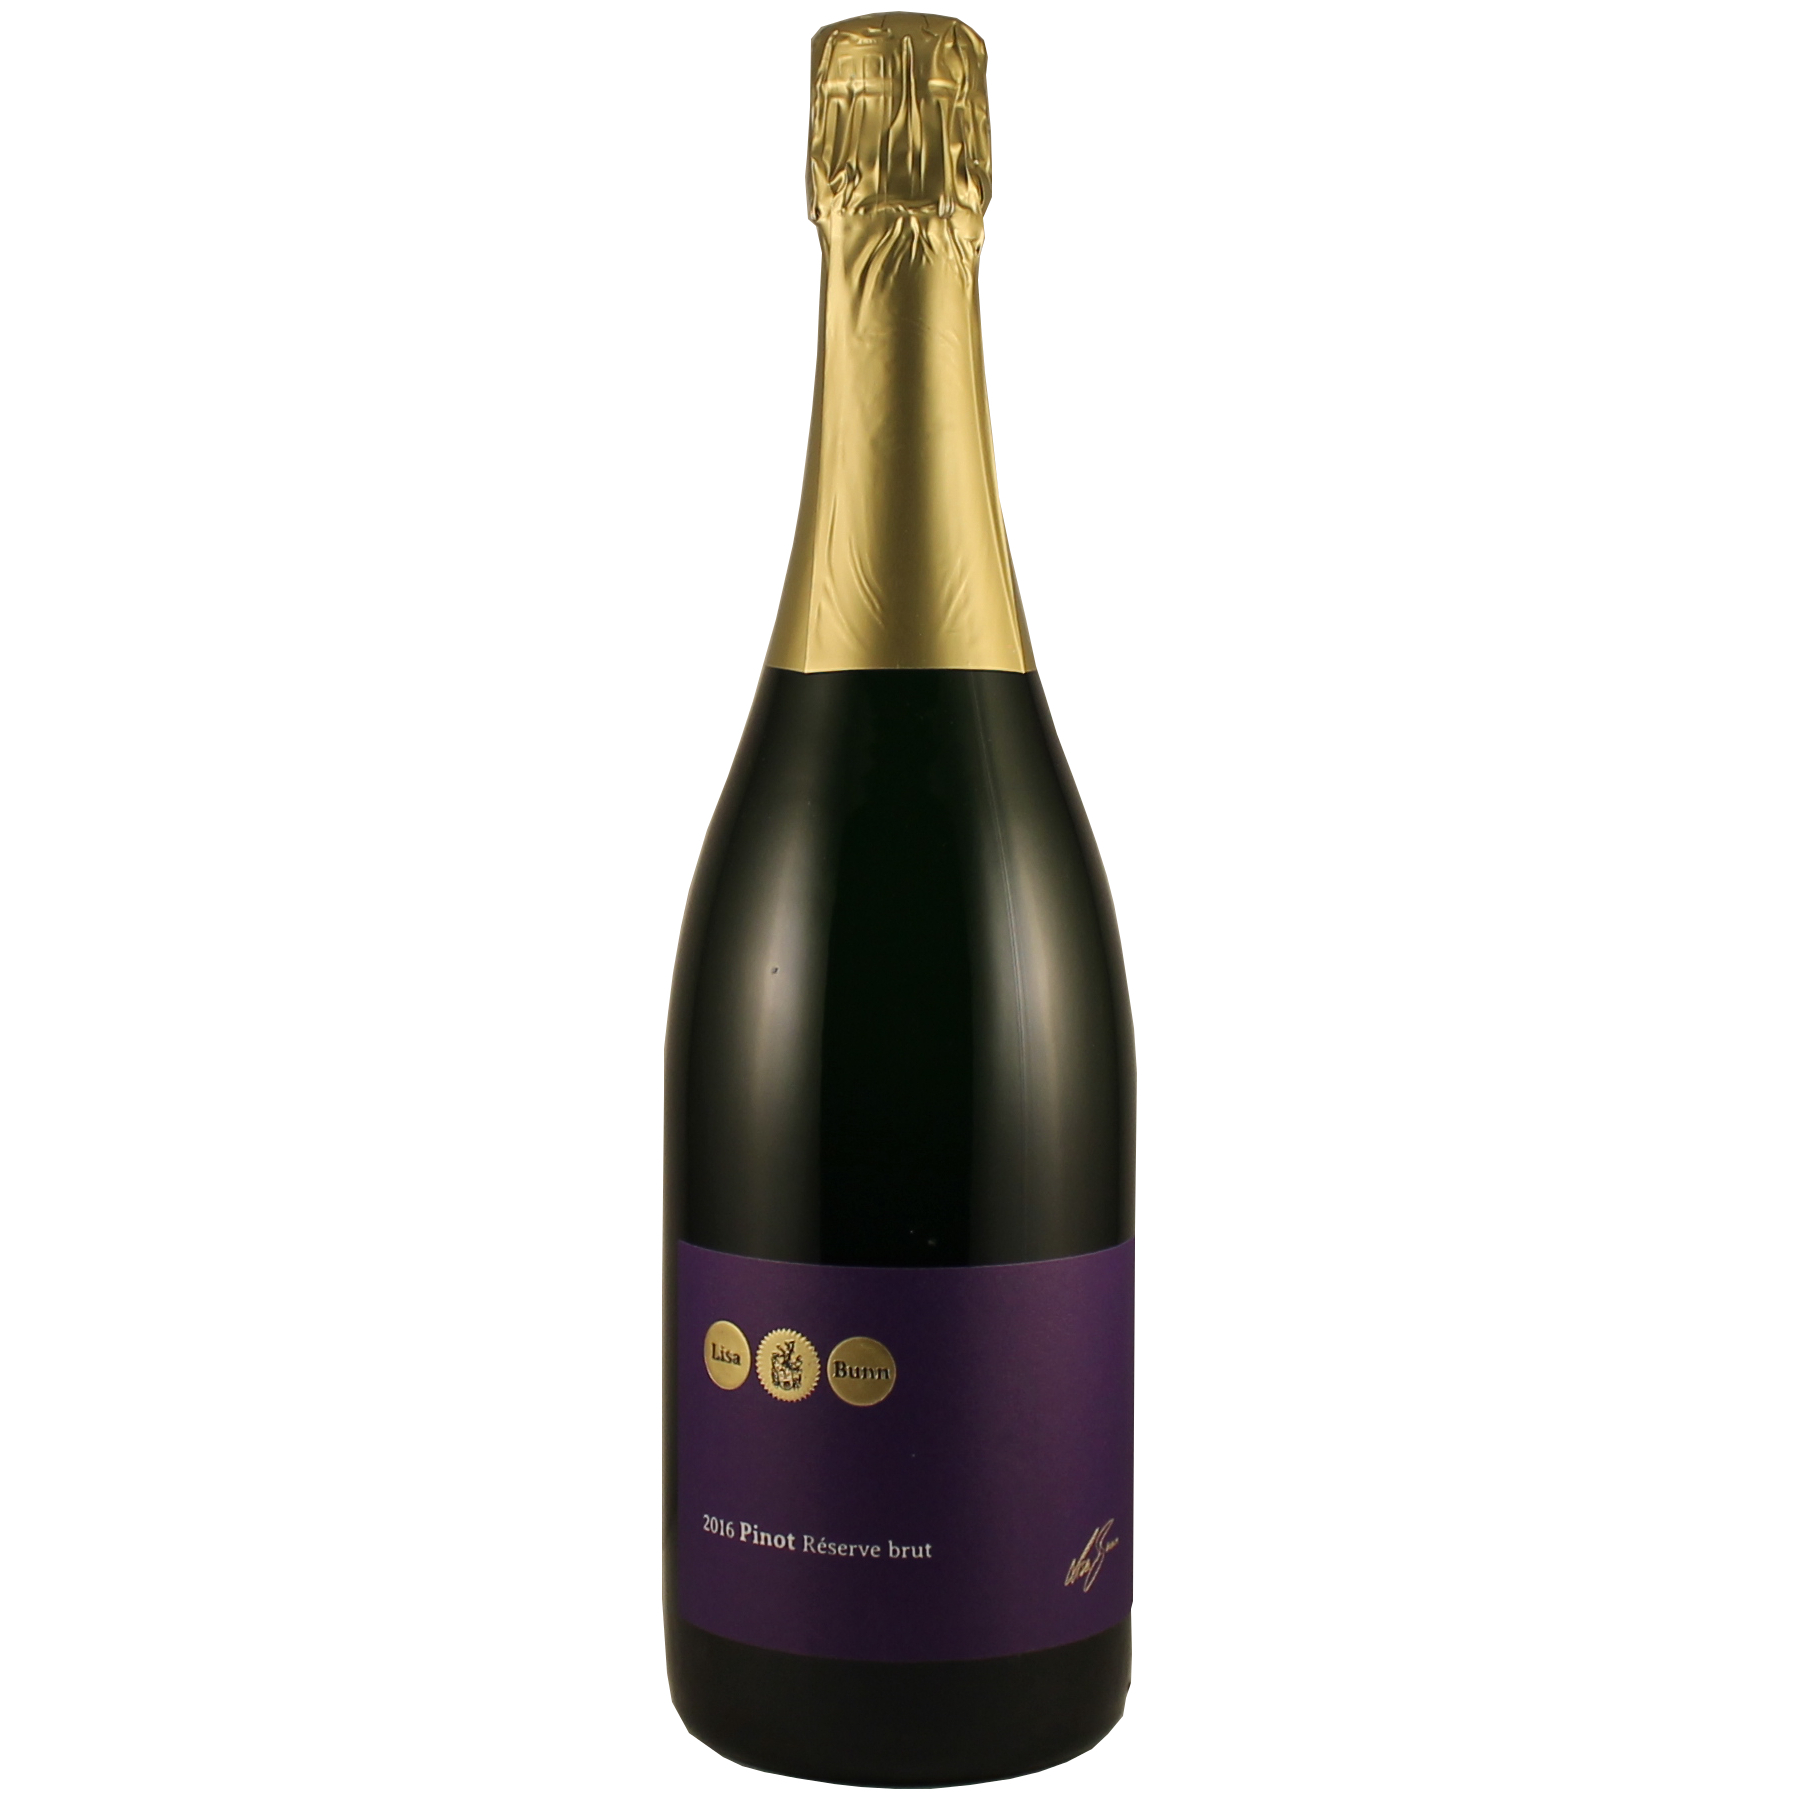 2016 Pinot Reserve Sekt Brut